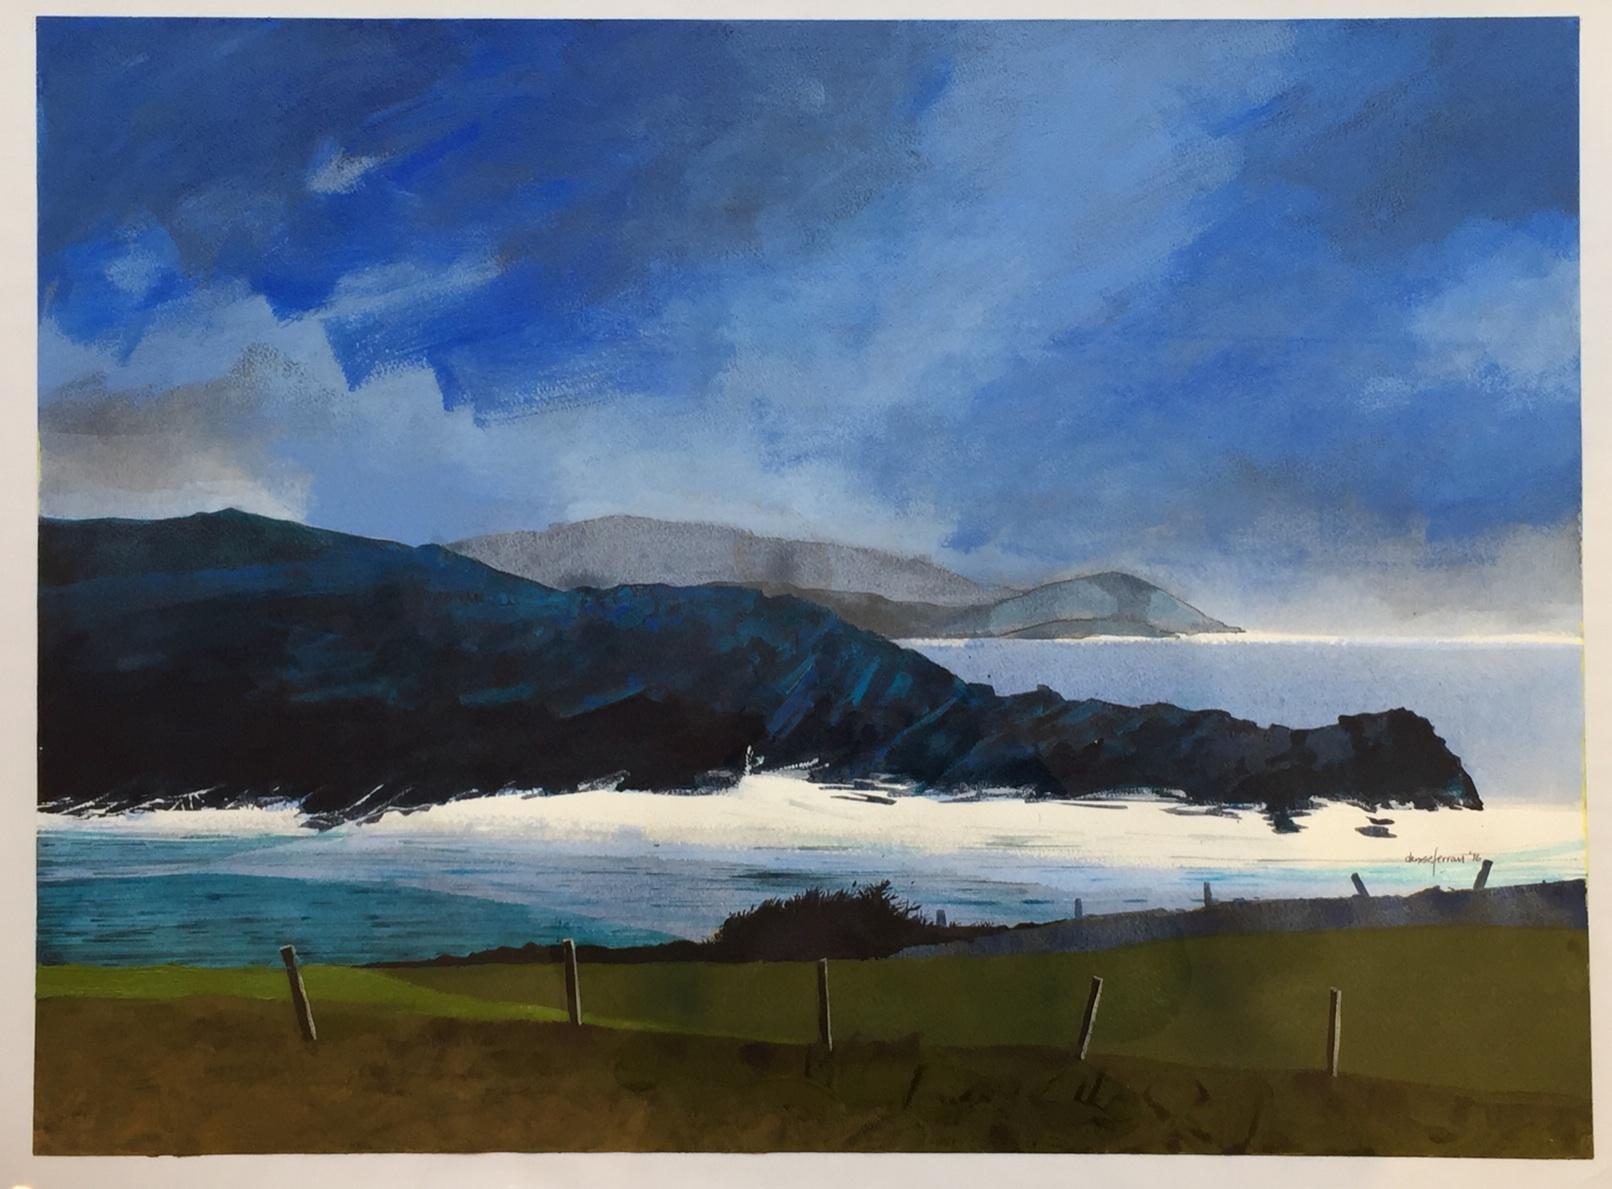 Denise Ferran PRUA, November Cill Rialaig, acrylic on watercolour paper, 57 x 76 cm